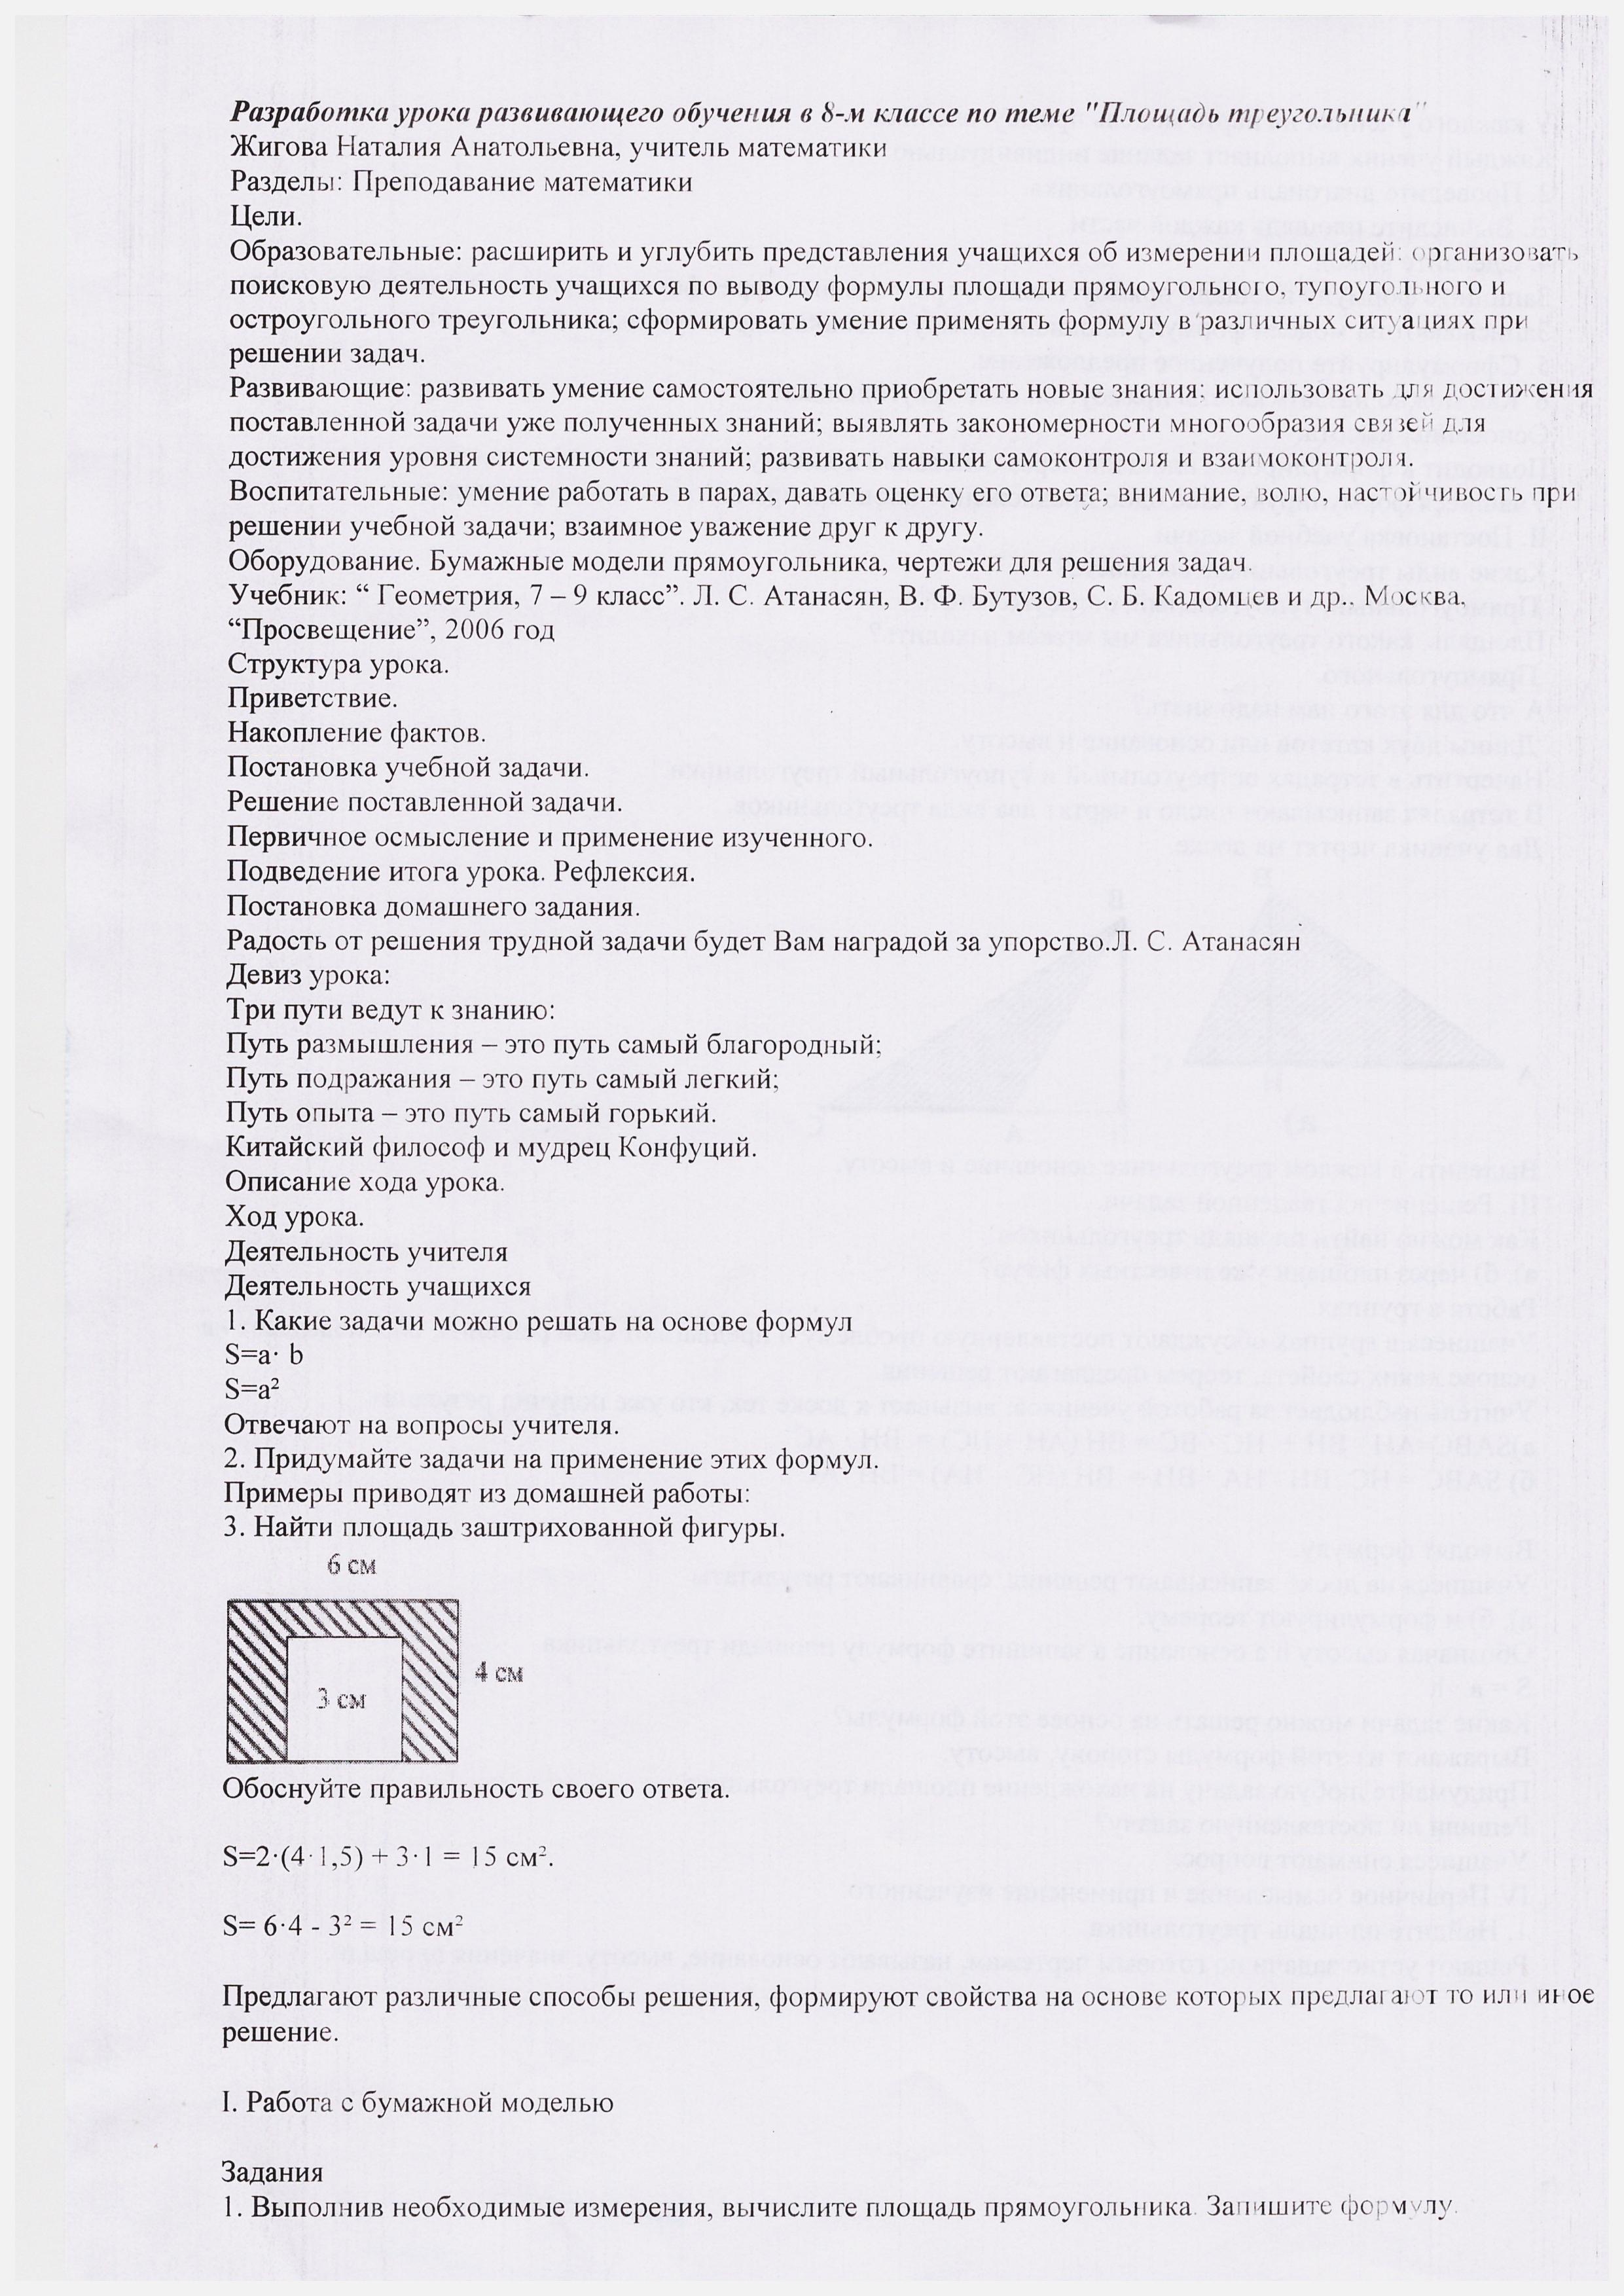 C:\Users\Администратор\Documents\Scan\Scan_20140310_052657.jpg